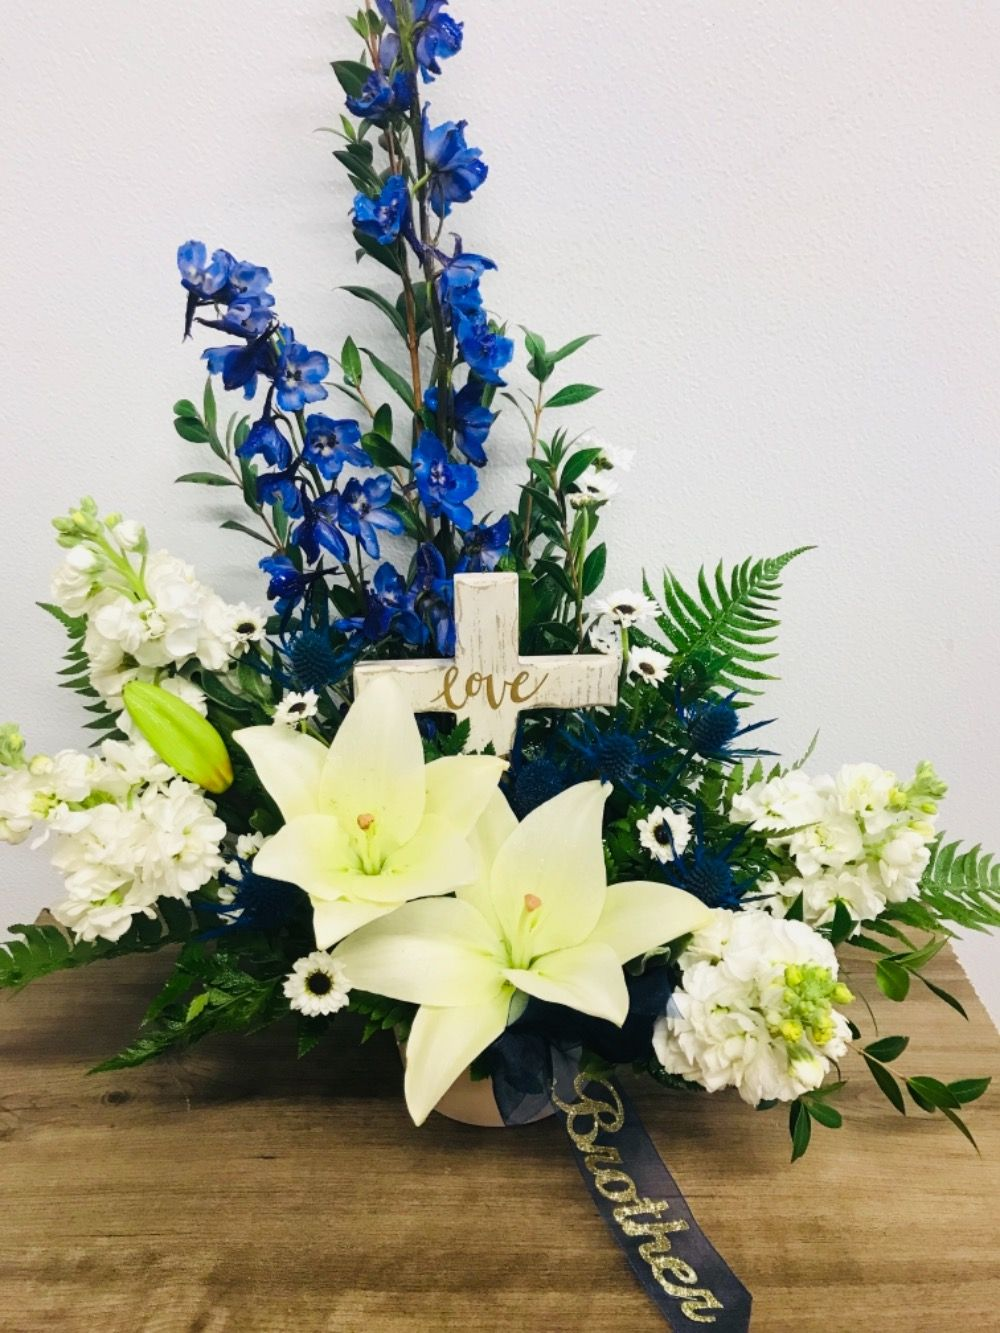 Vase arrangement floral keepsake sympathy picturesque www sympathy and funeral flowers bismarck florist rustic petals jpg 300x300 vase arrangement floral keepsake sympathy picturesque izmirmasajfo